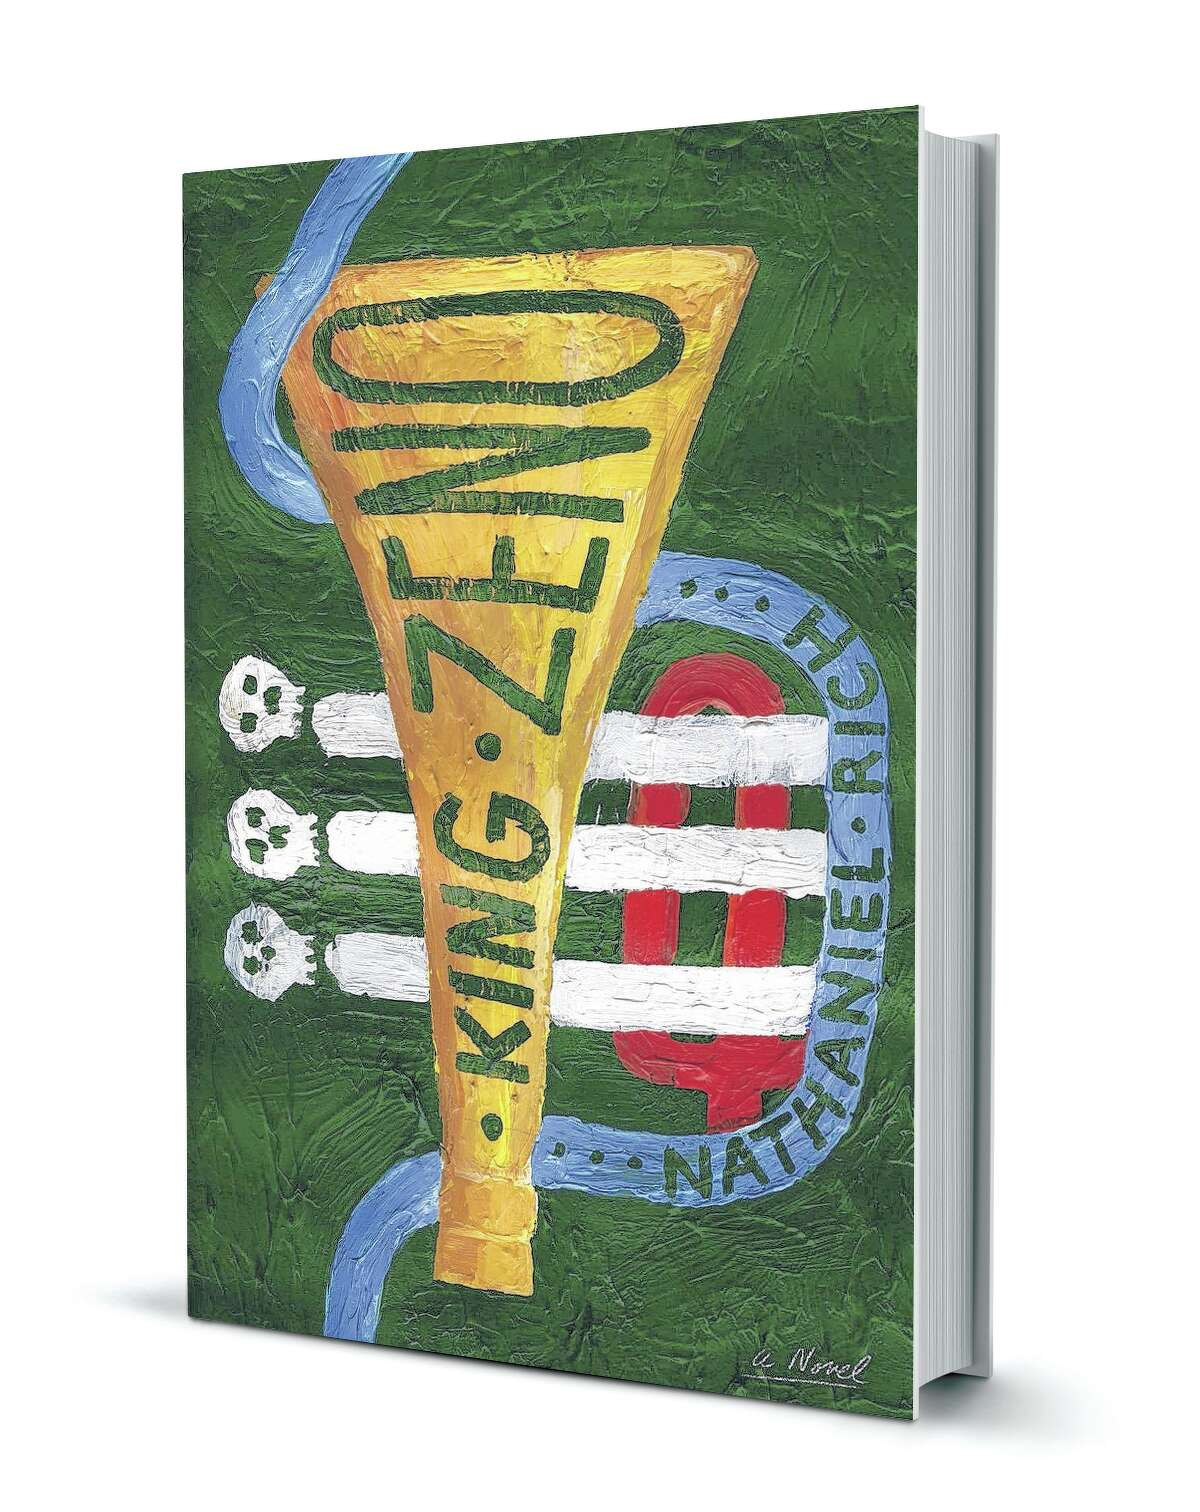 """King Zeno"" is Nathaniel Rich's third novel."